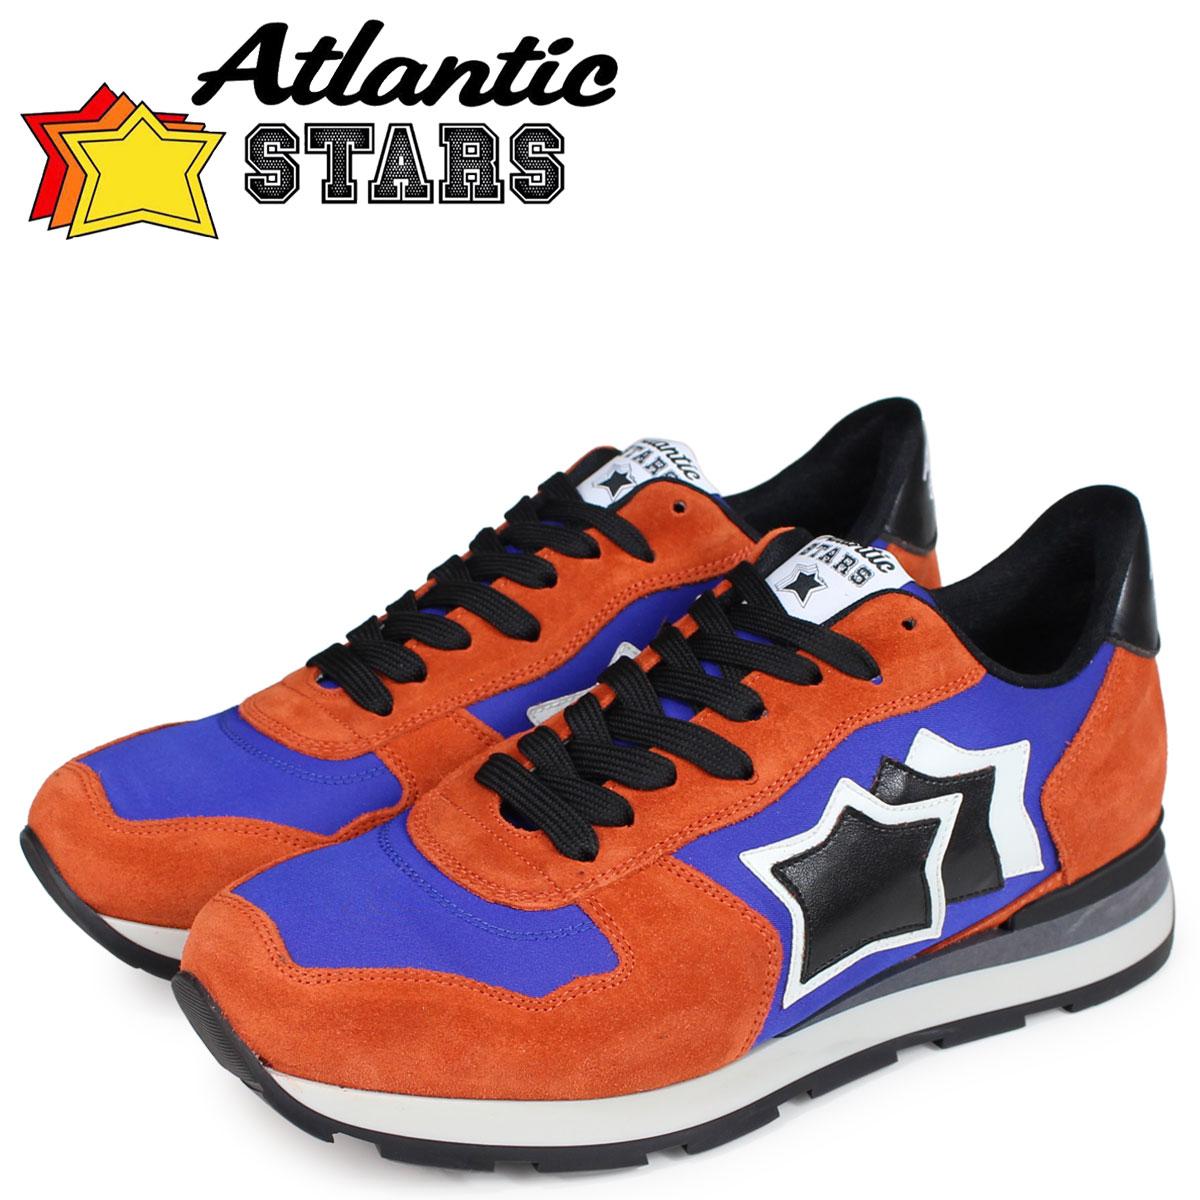 Atlantic STARS メンズ スニーカー アトランティックスターズ アンタレス ANTARES EAR-81N オレンジ